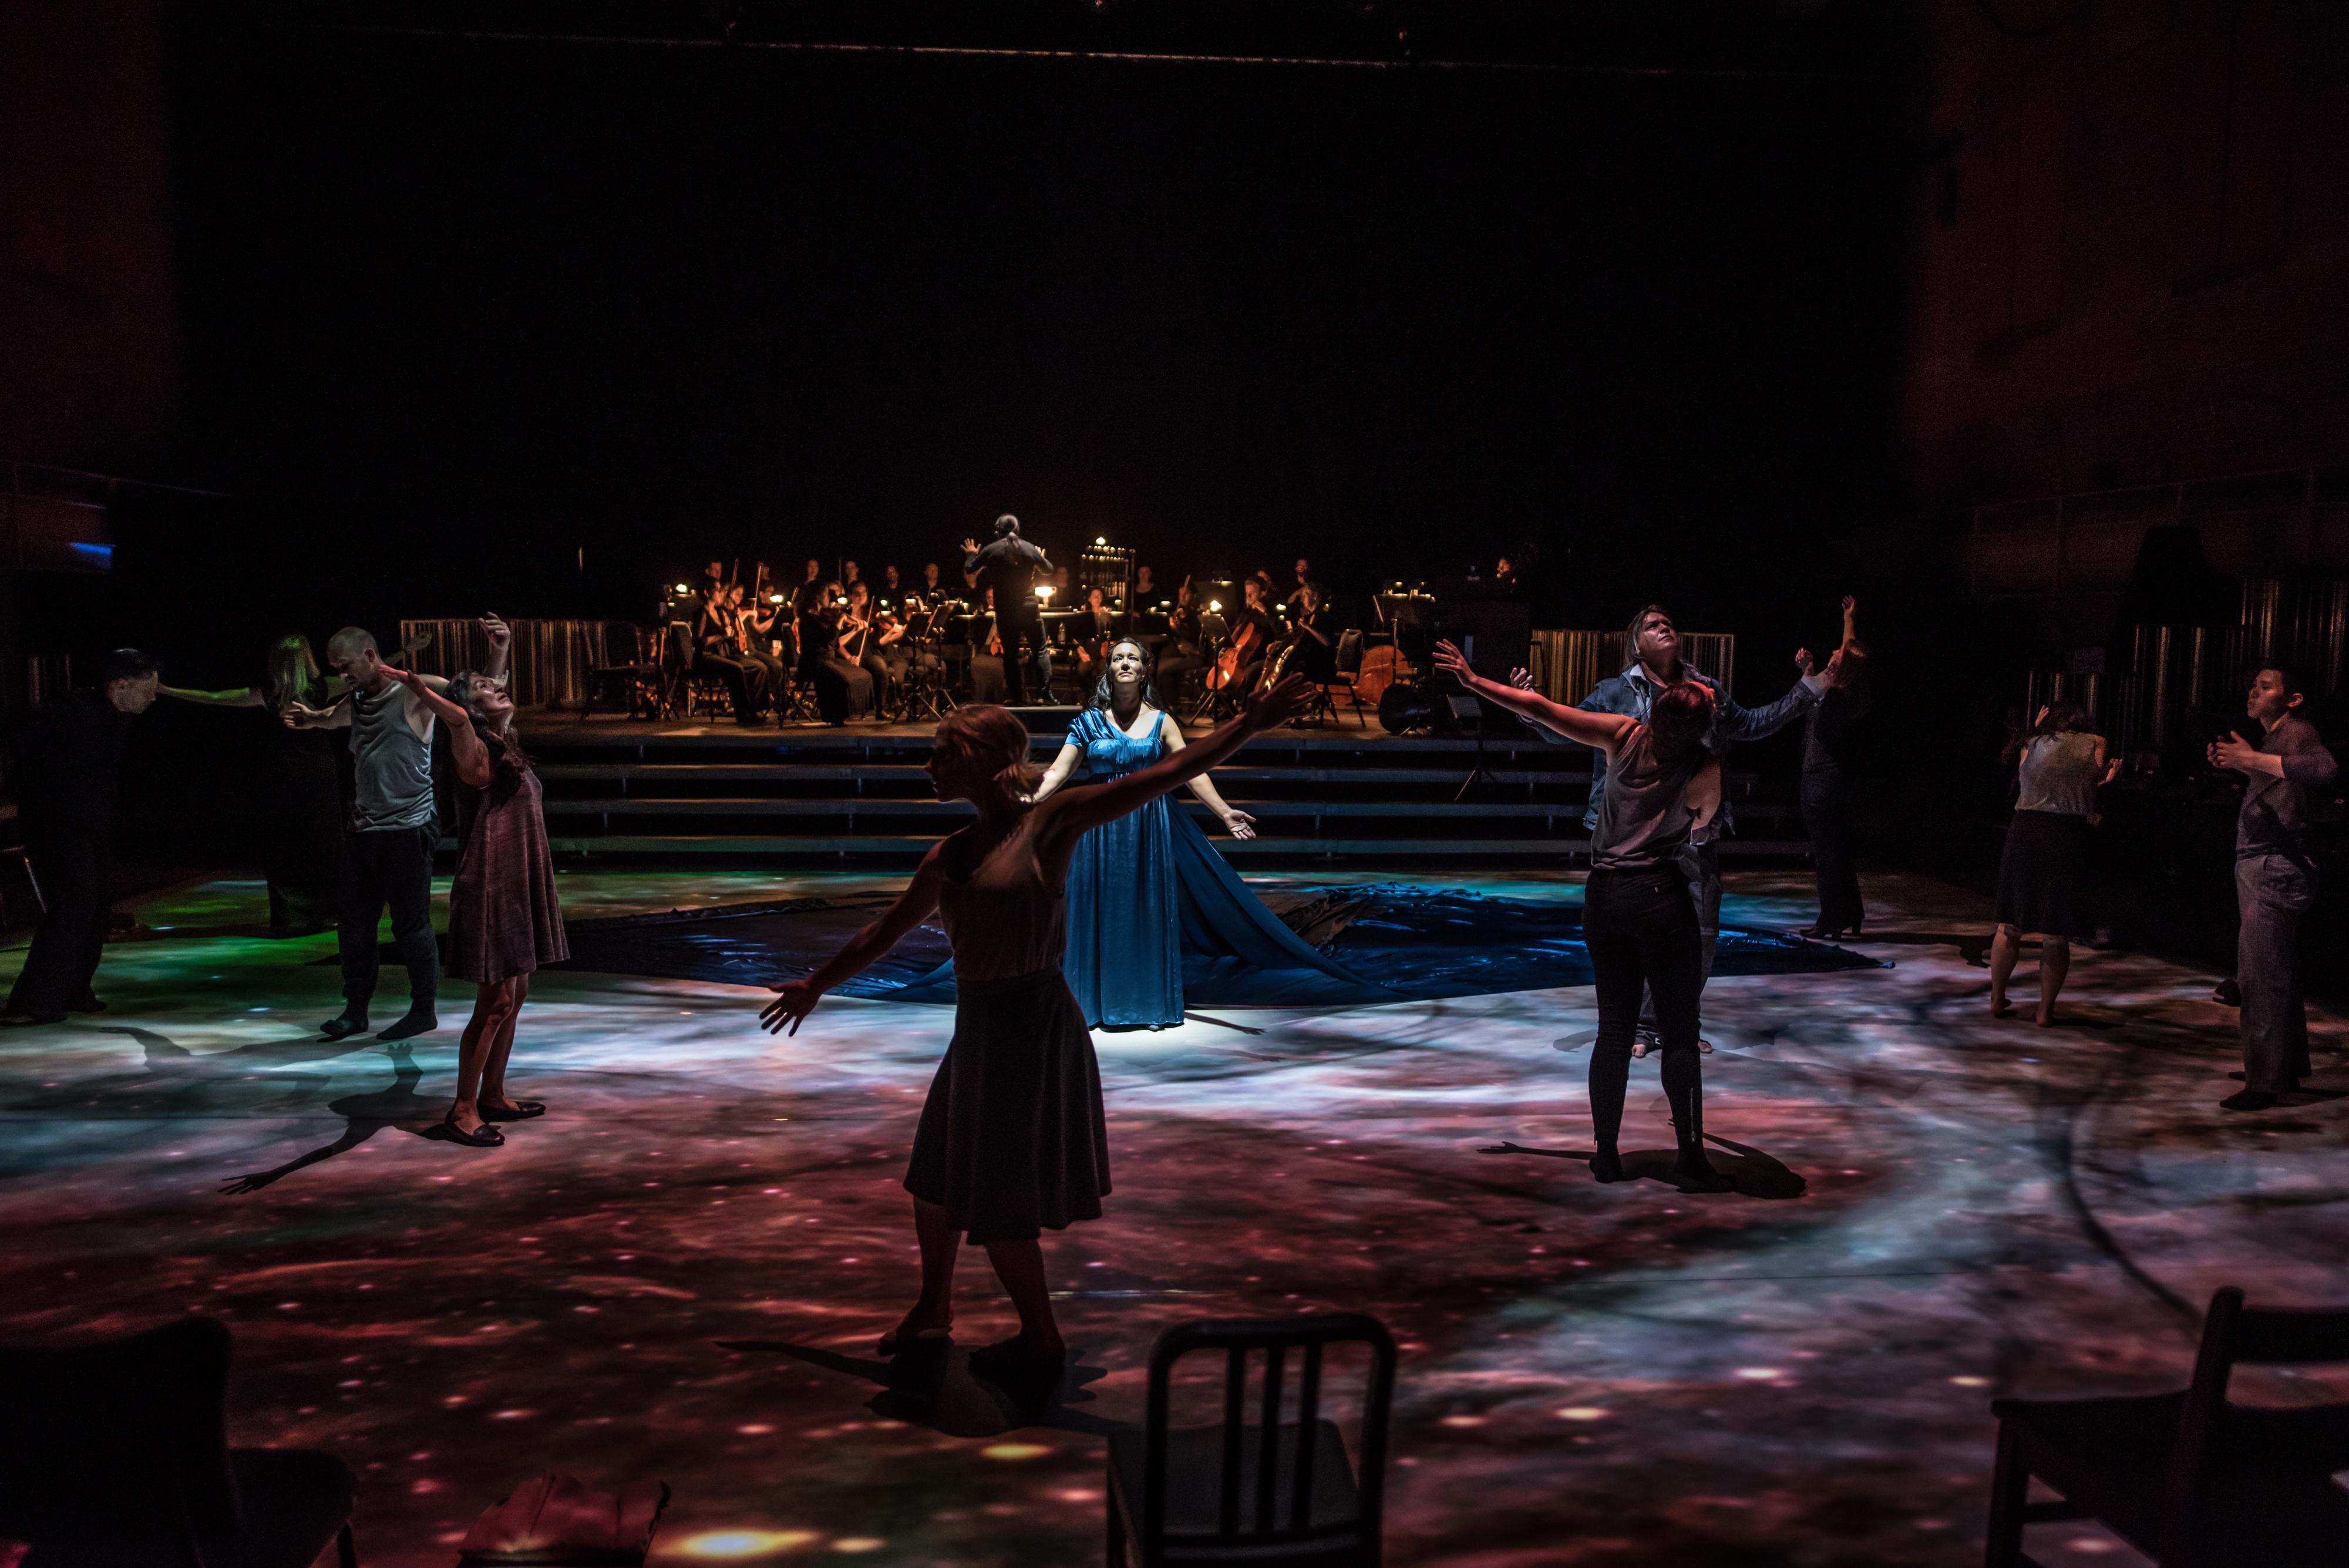 Bearing, dance-opera co-directed by Yvette Nolan and Michael Greyeyes. Photo by Dahlia Katz